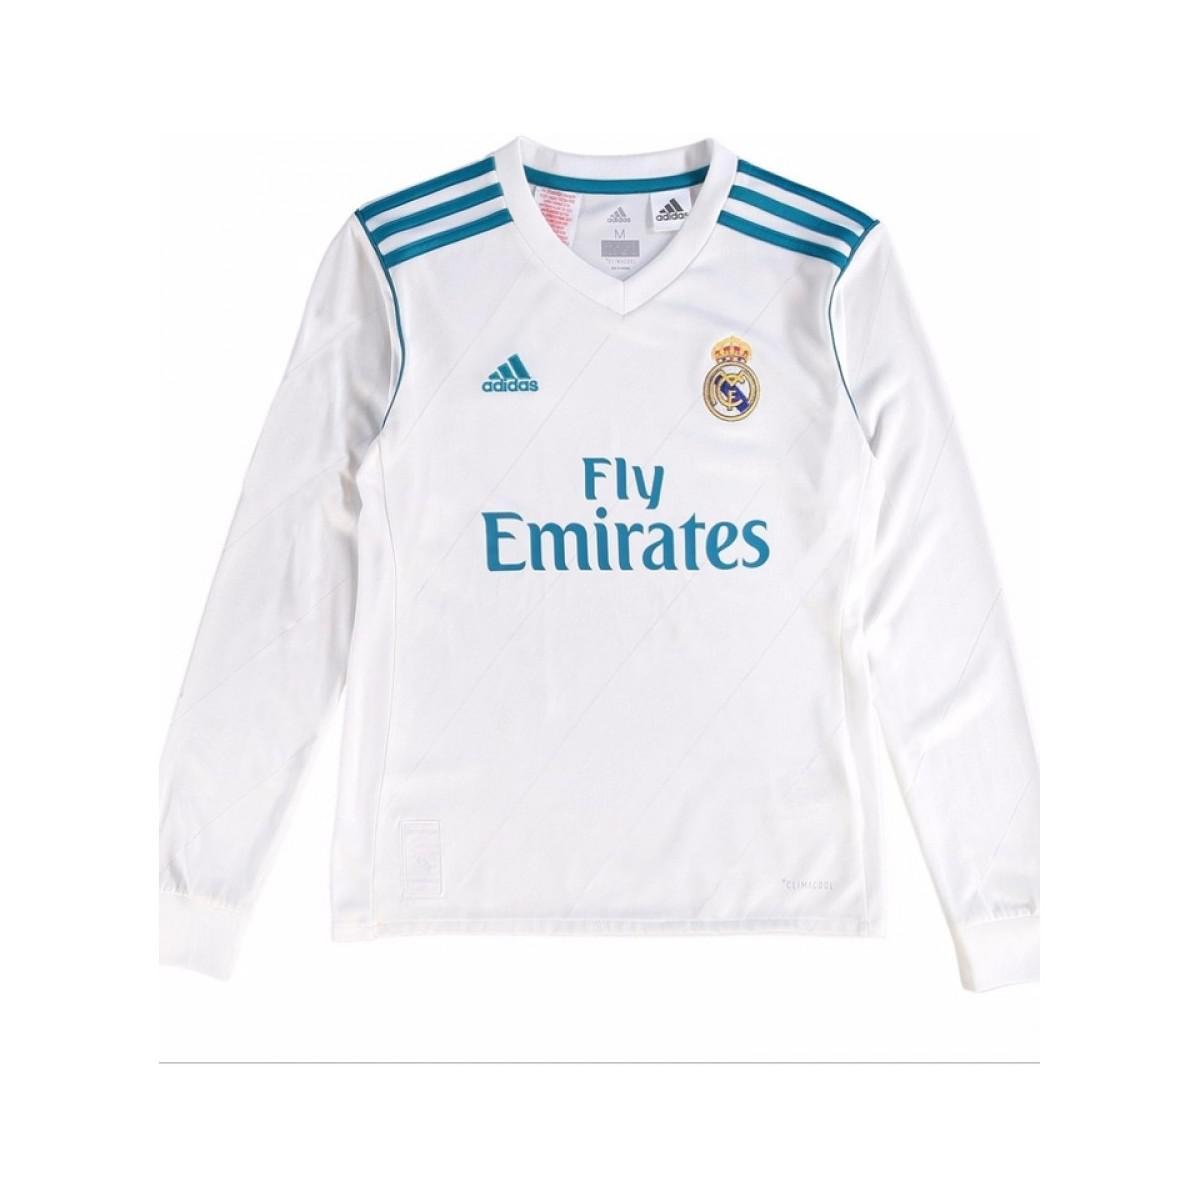 00c2a0b8cd8 Adidas - 2017-18 Real Madrid Long Sleeve Home Shirt - Kids (modric 10. View  fullscreen